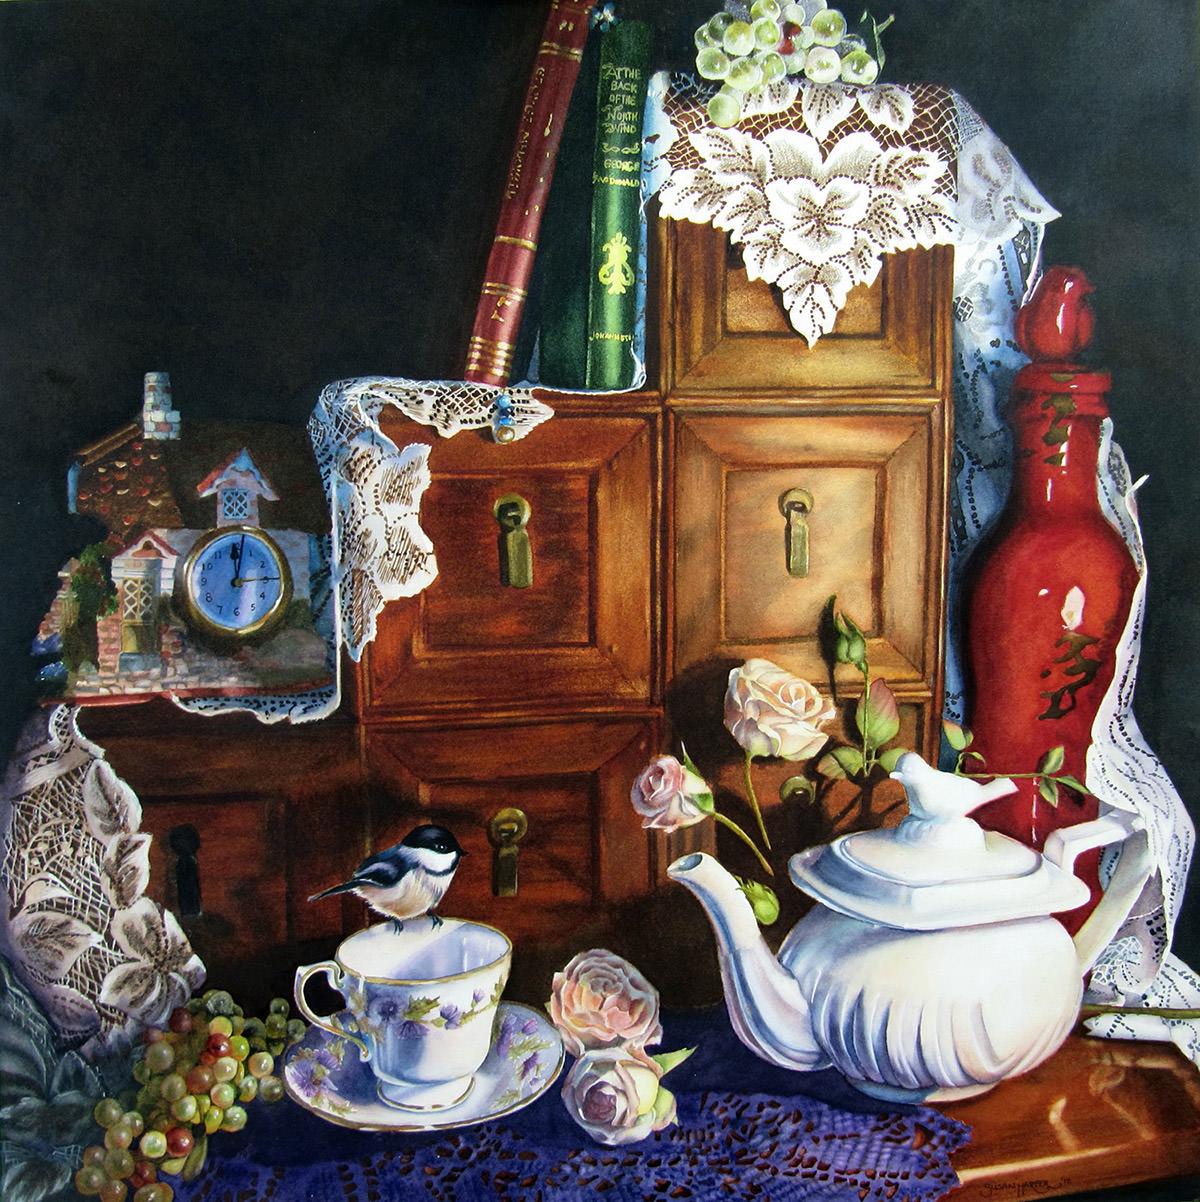 #WorldWatercolorGroup - Watercolor by Susan Walsh Harper - Still Life - #doodlewash